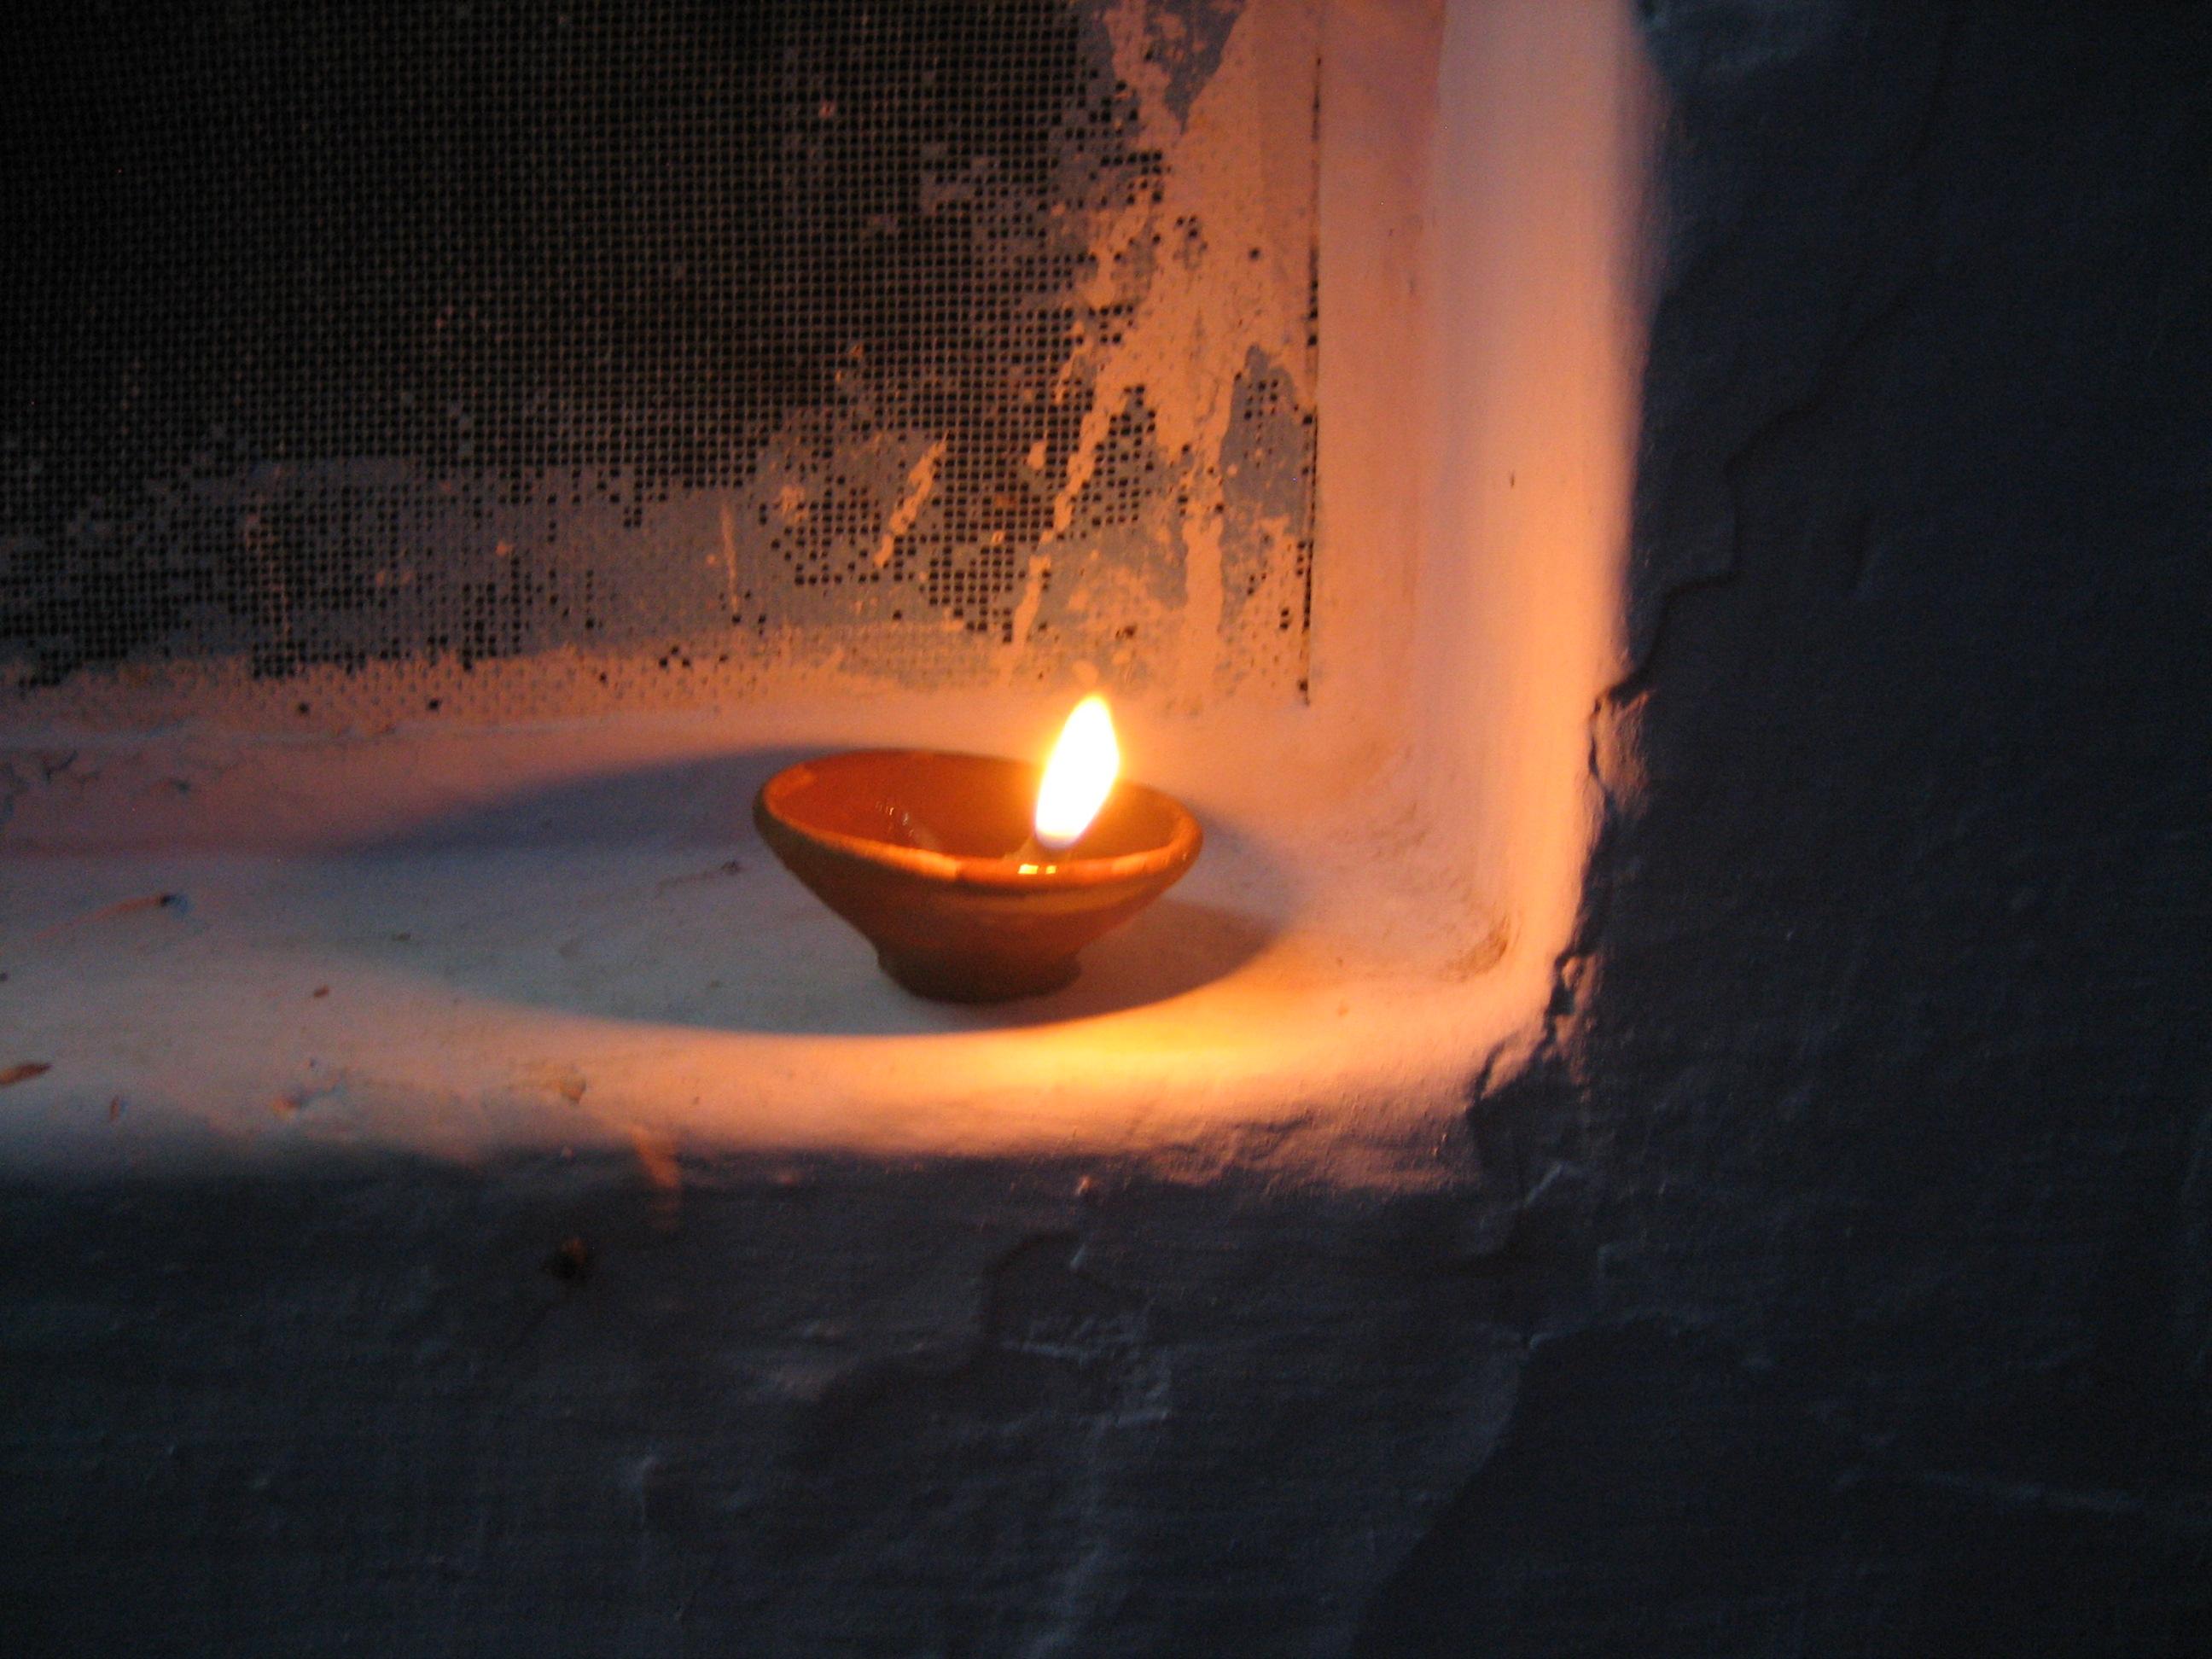 bougie pushkar diwali